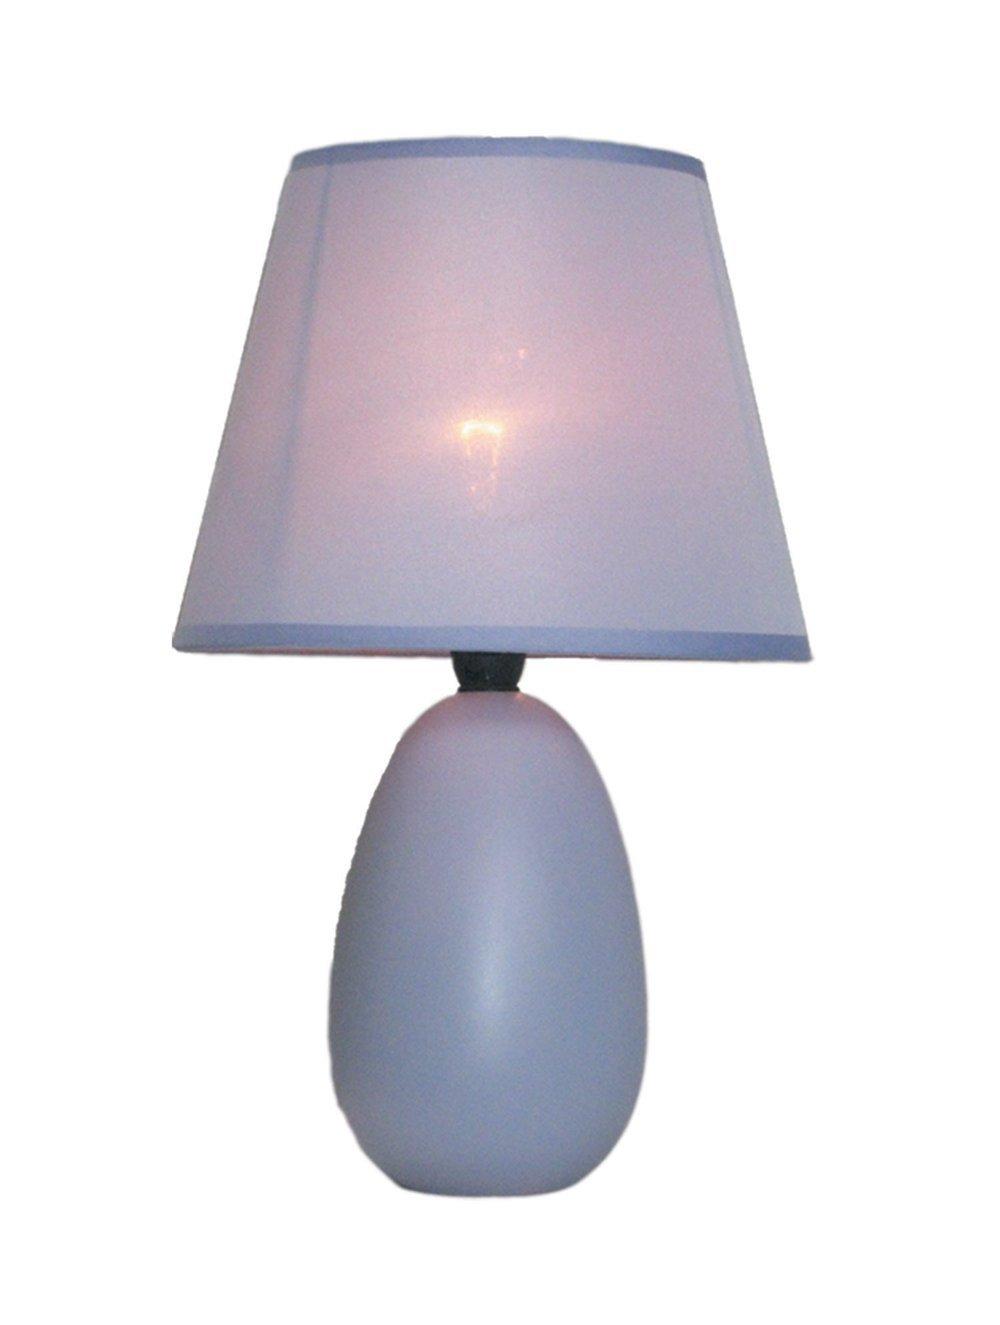 Simple Designs LT2009-PRP Mini Oval Egg Ceramic Table Lamp, Purple